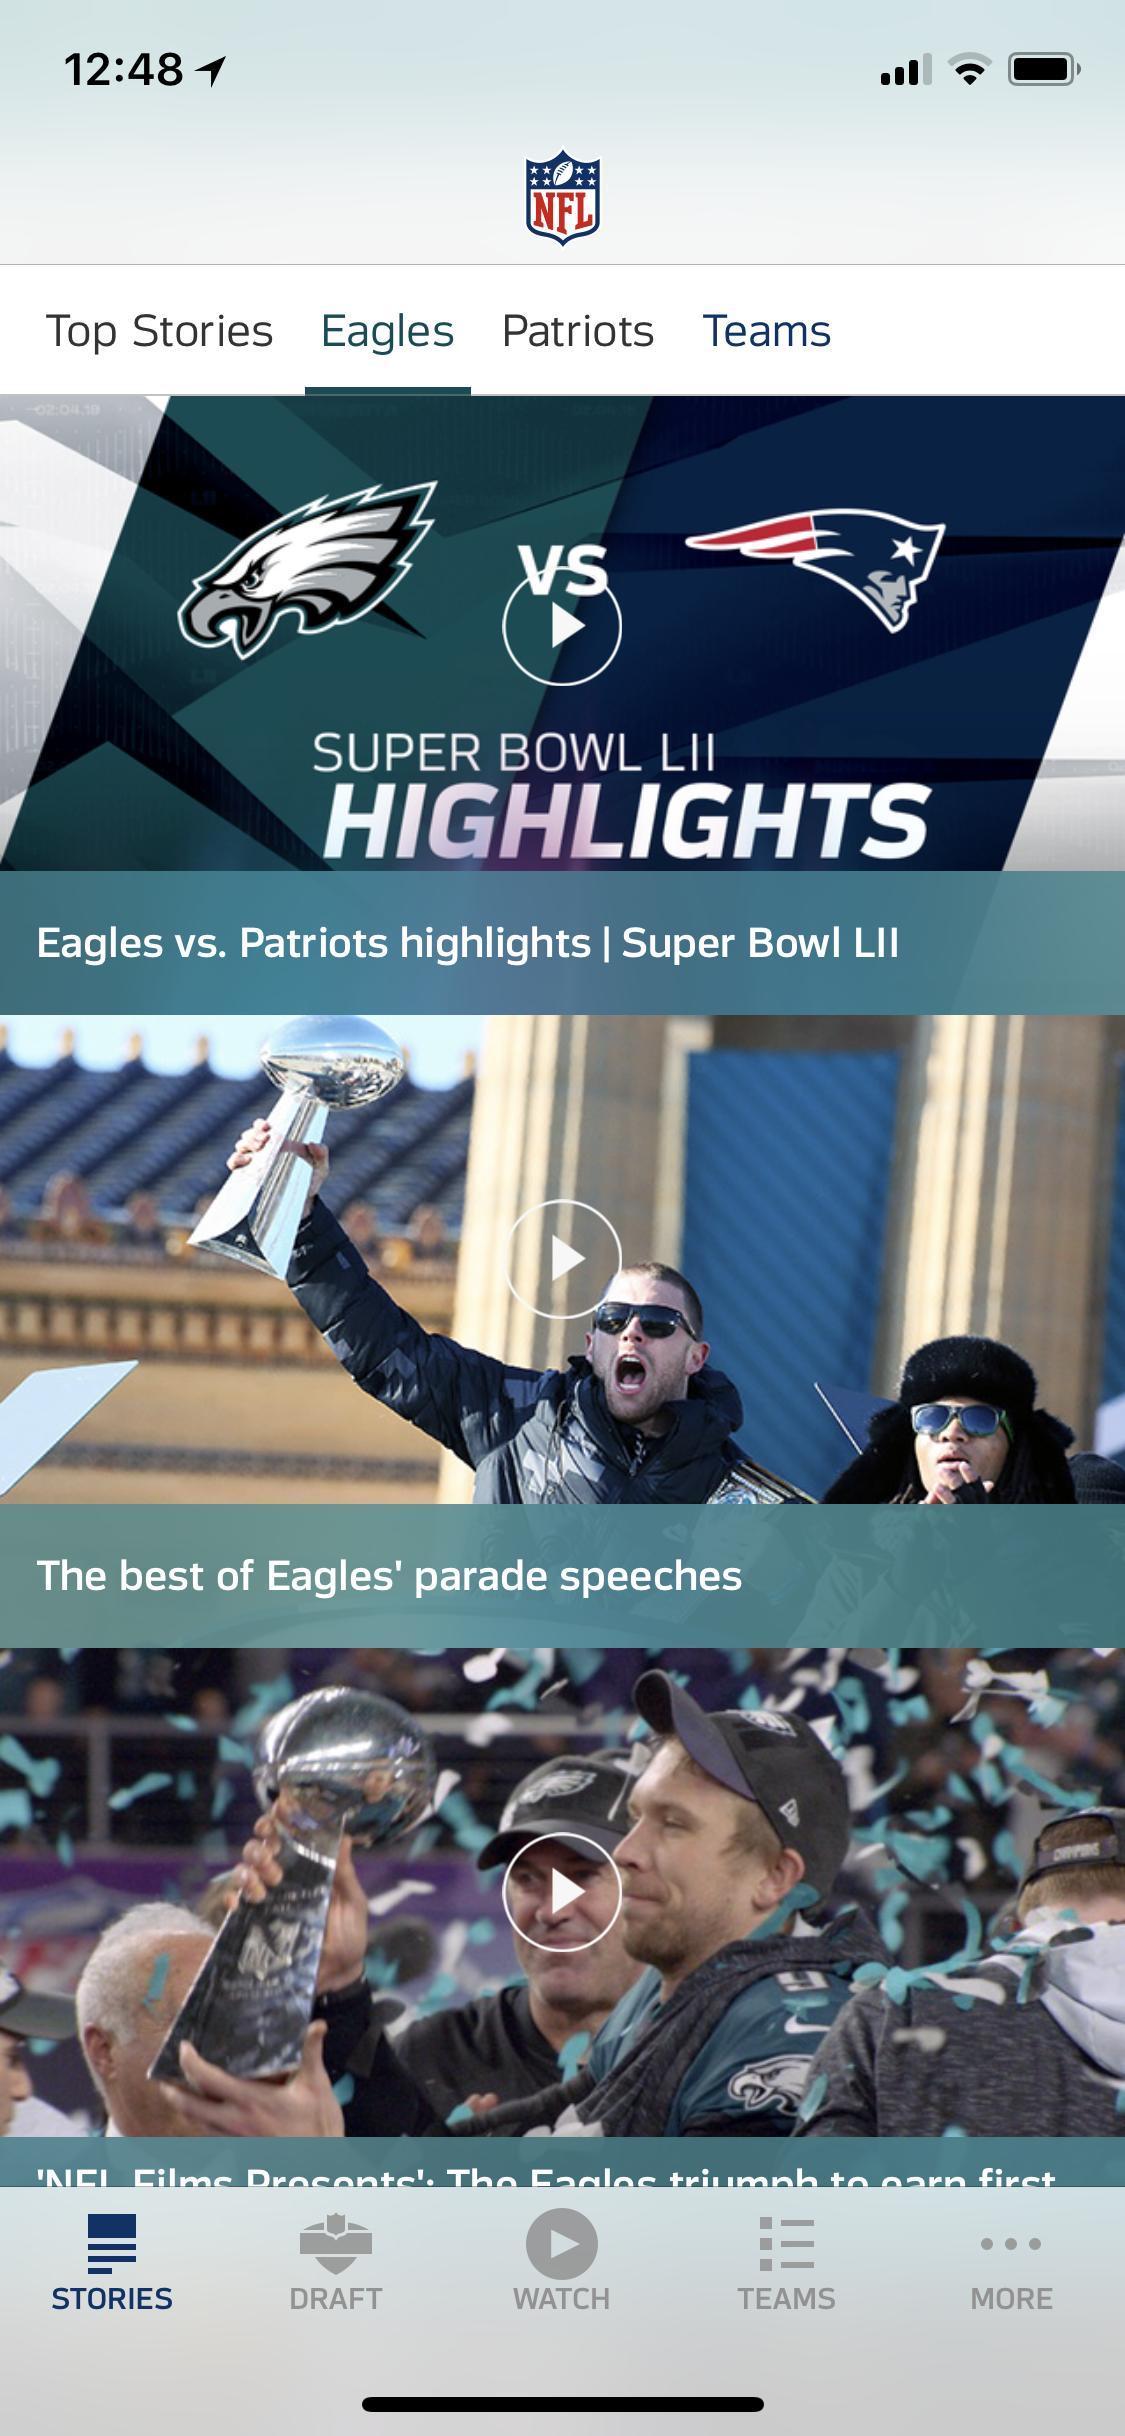 Download the NFL Mobile App